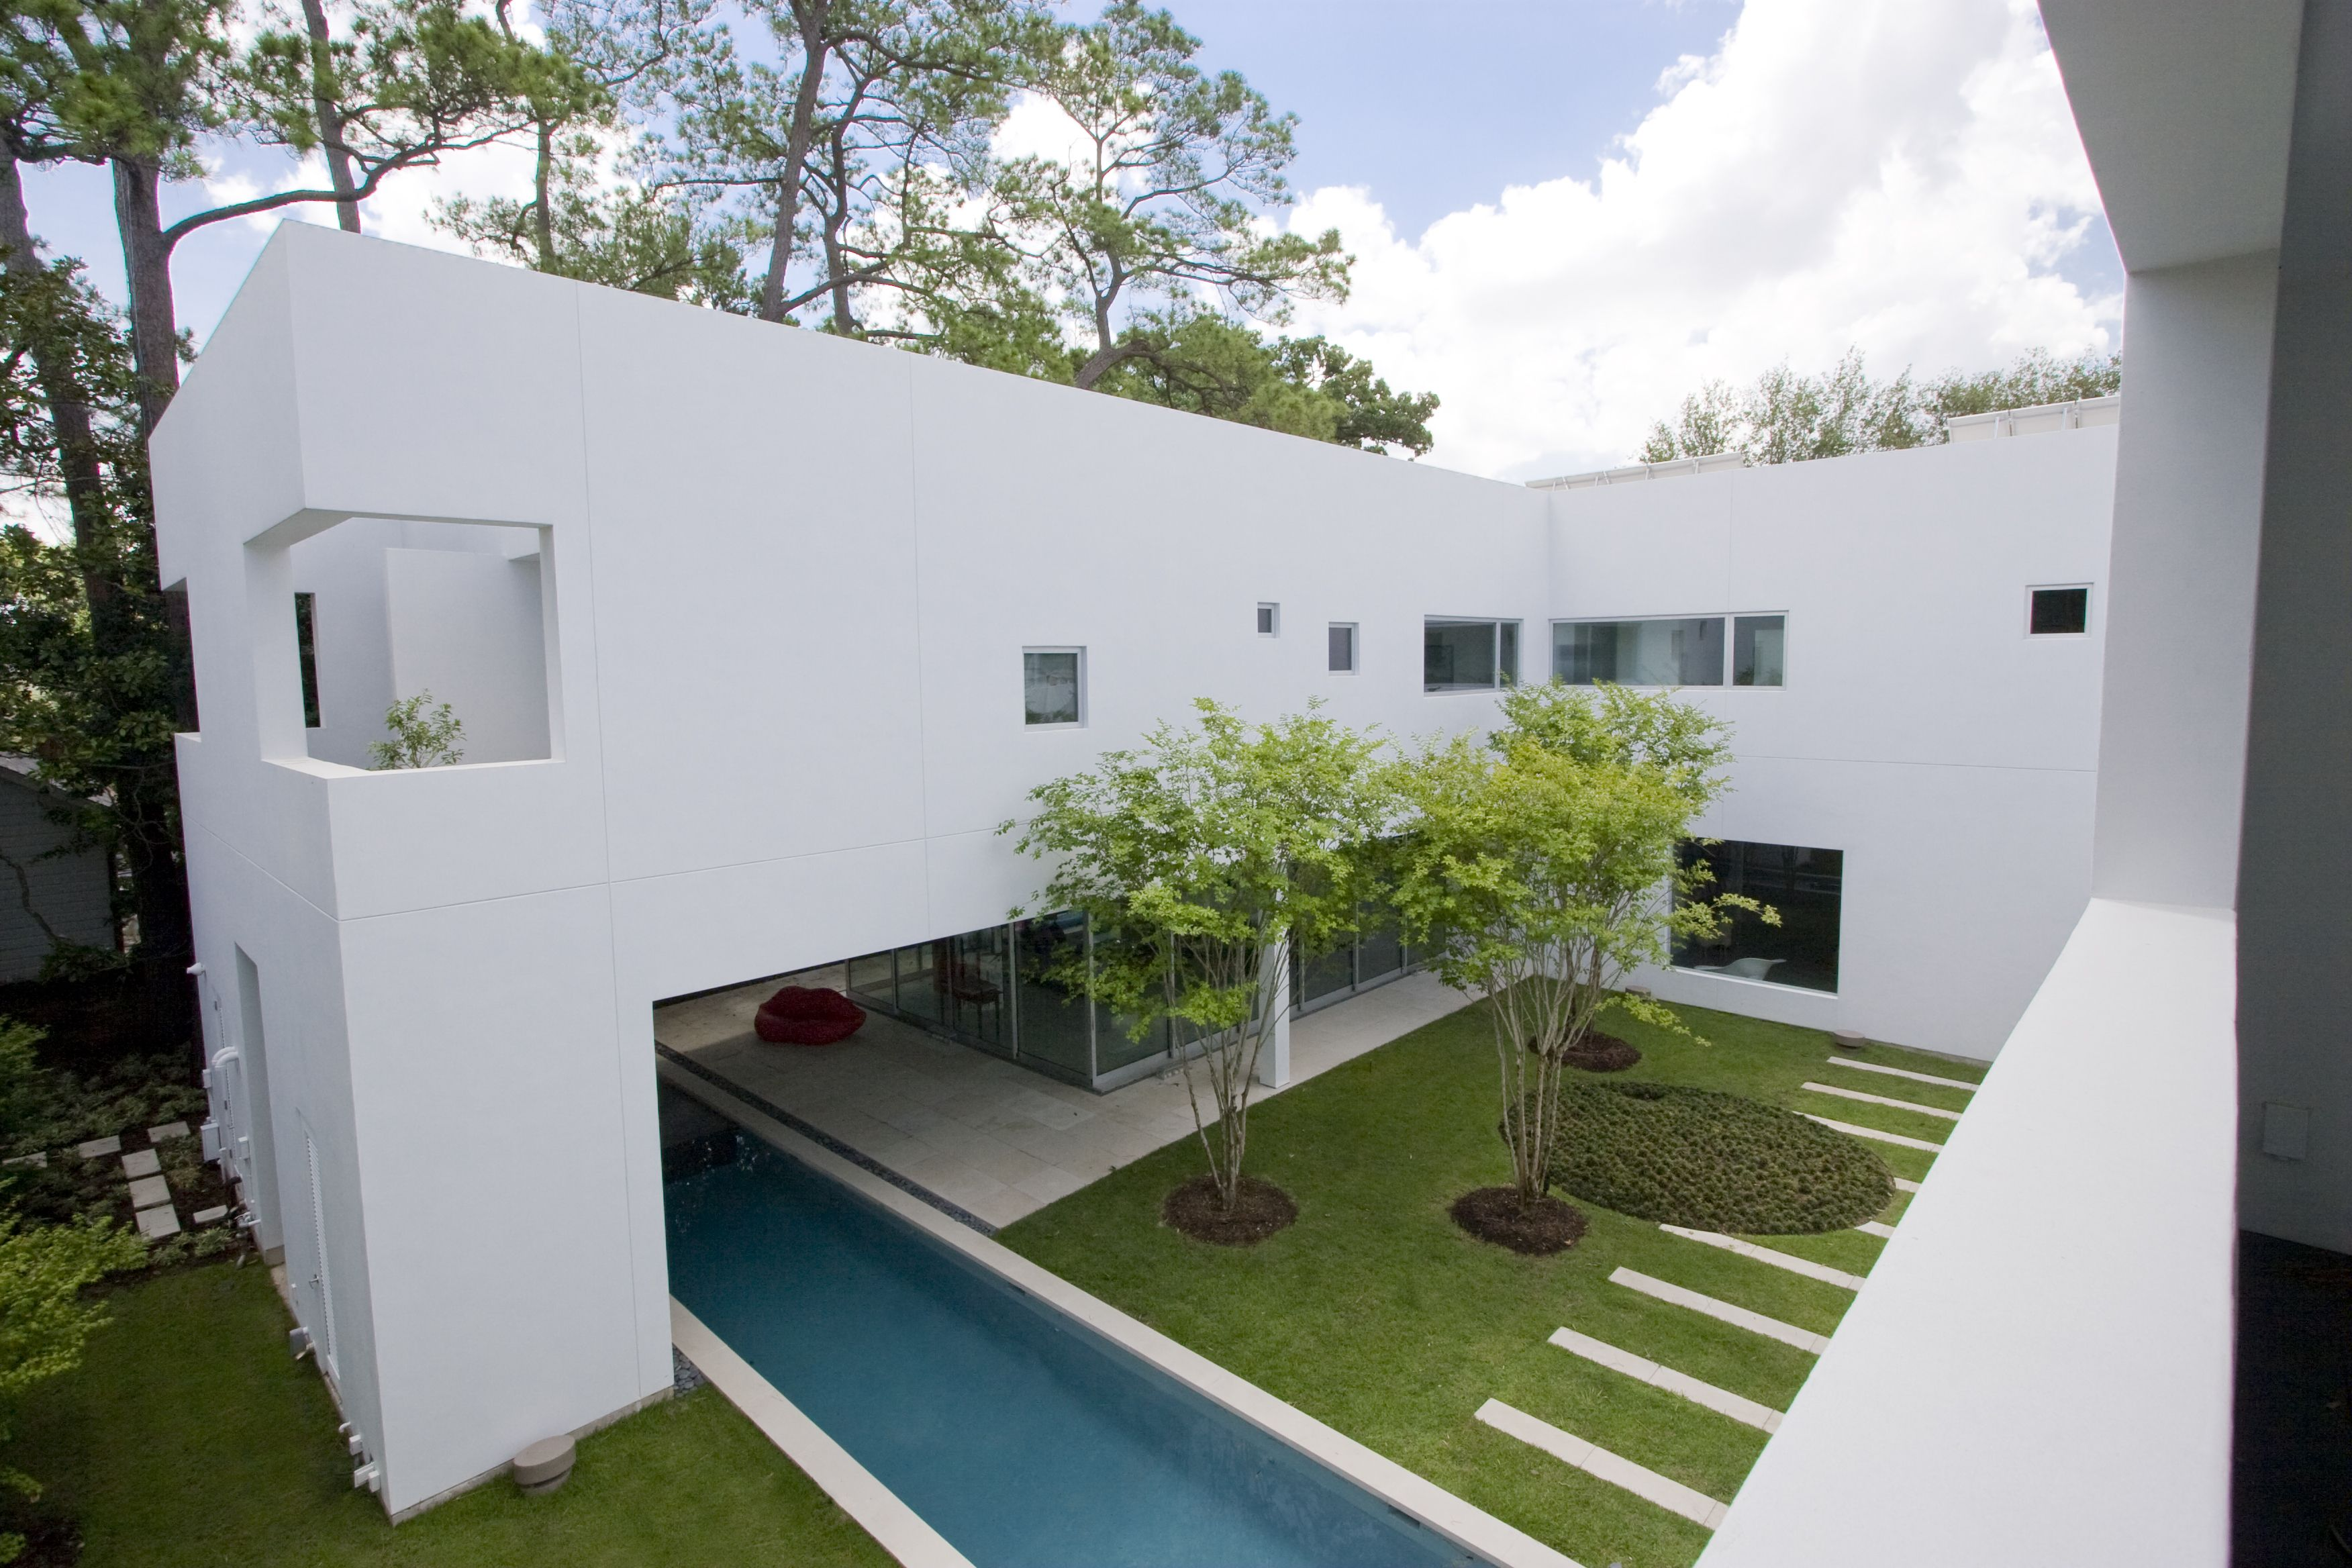 trendy architecture - google search | architecture | pinterest